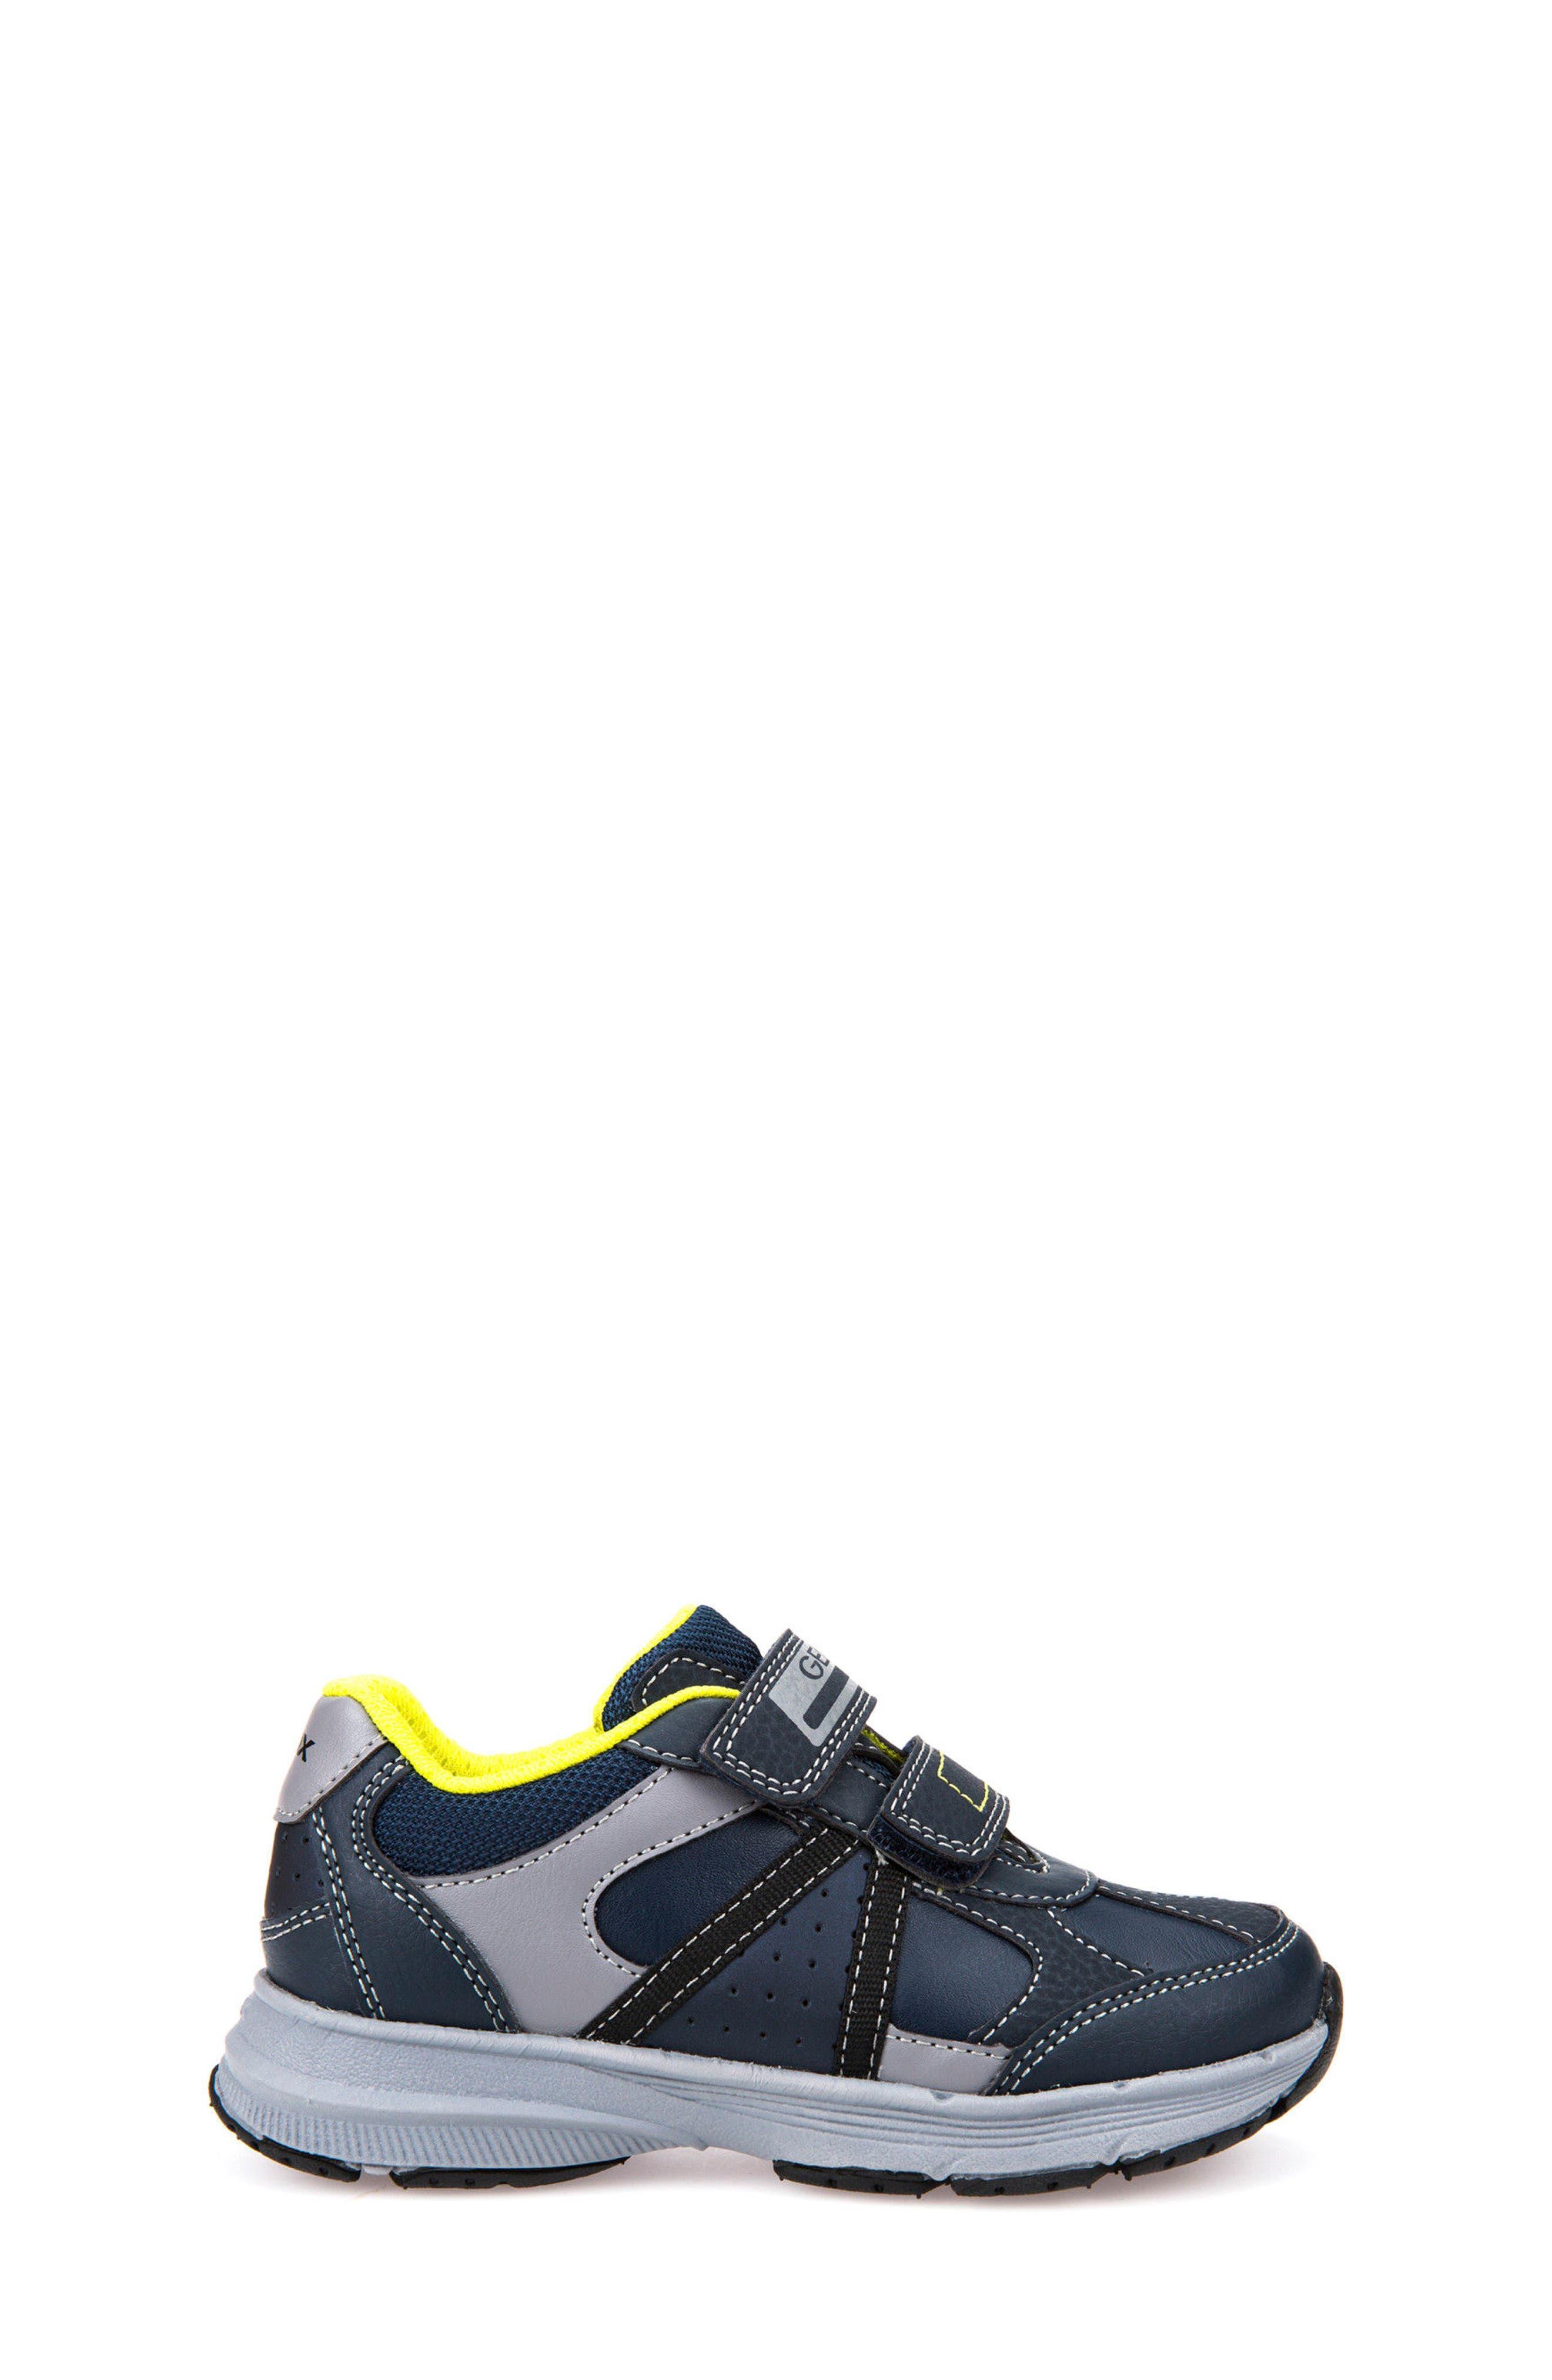 Top Fly Sneaker,                             Alternate thumbnail 8, color,